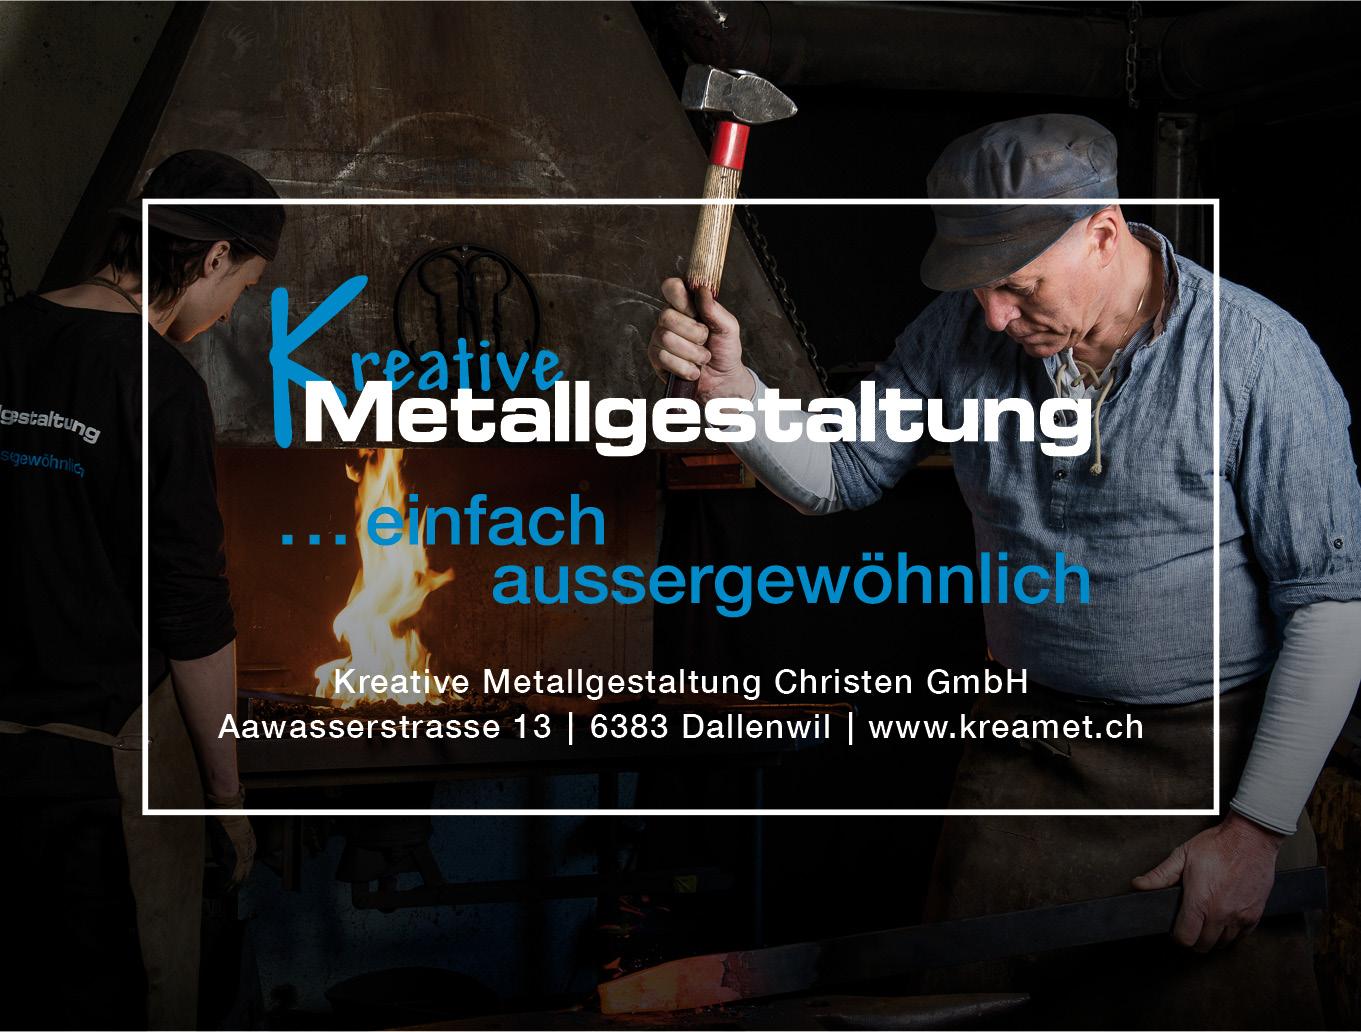 Kreative Metallgestaltung Christen